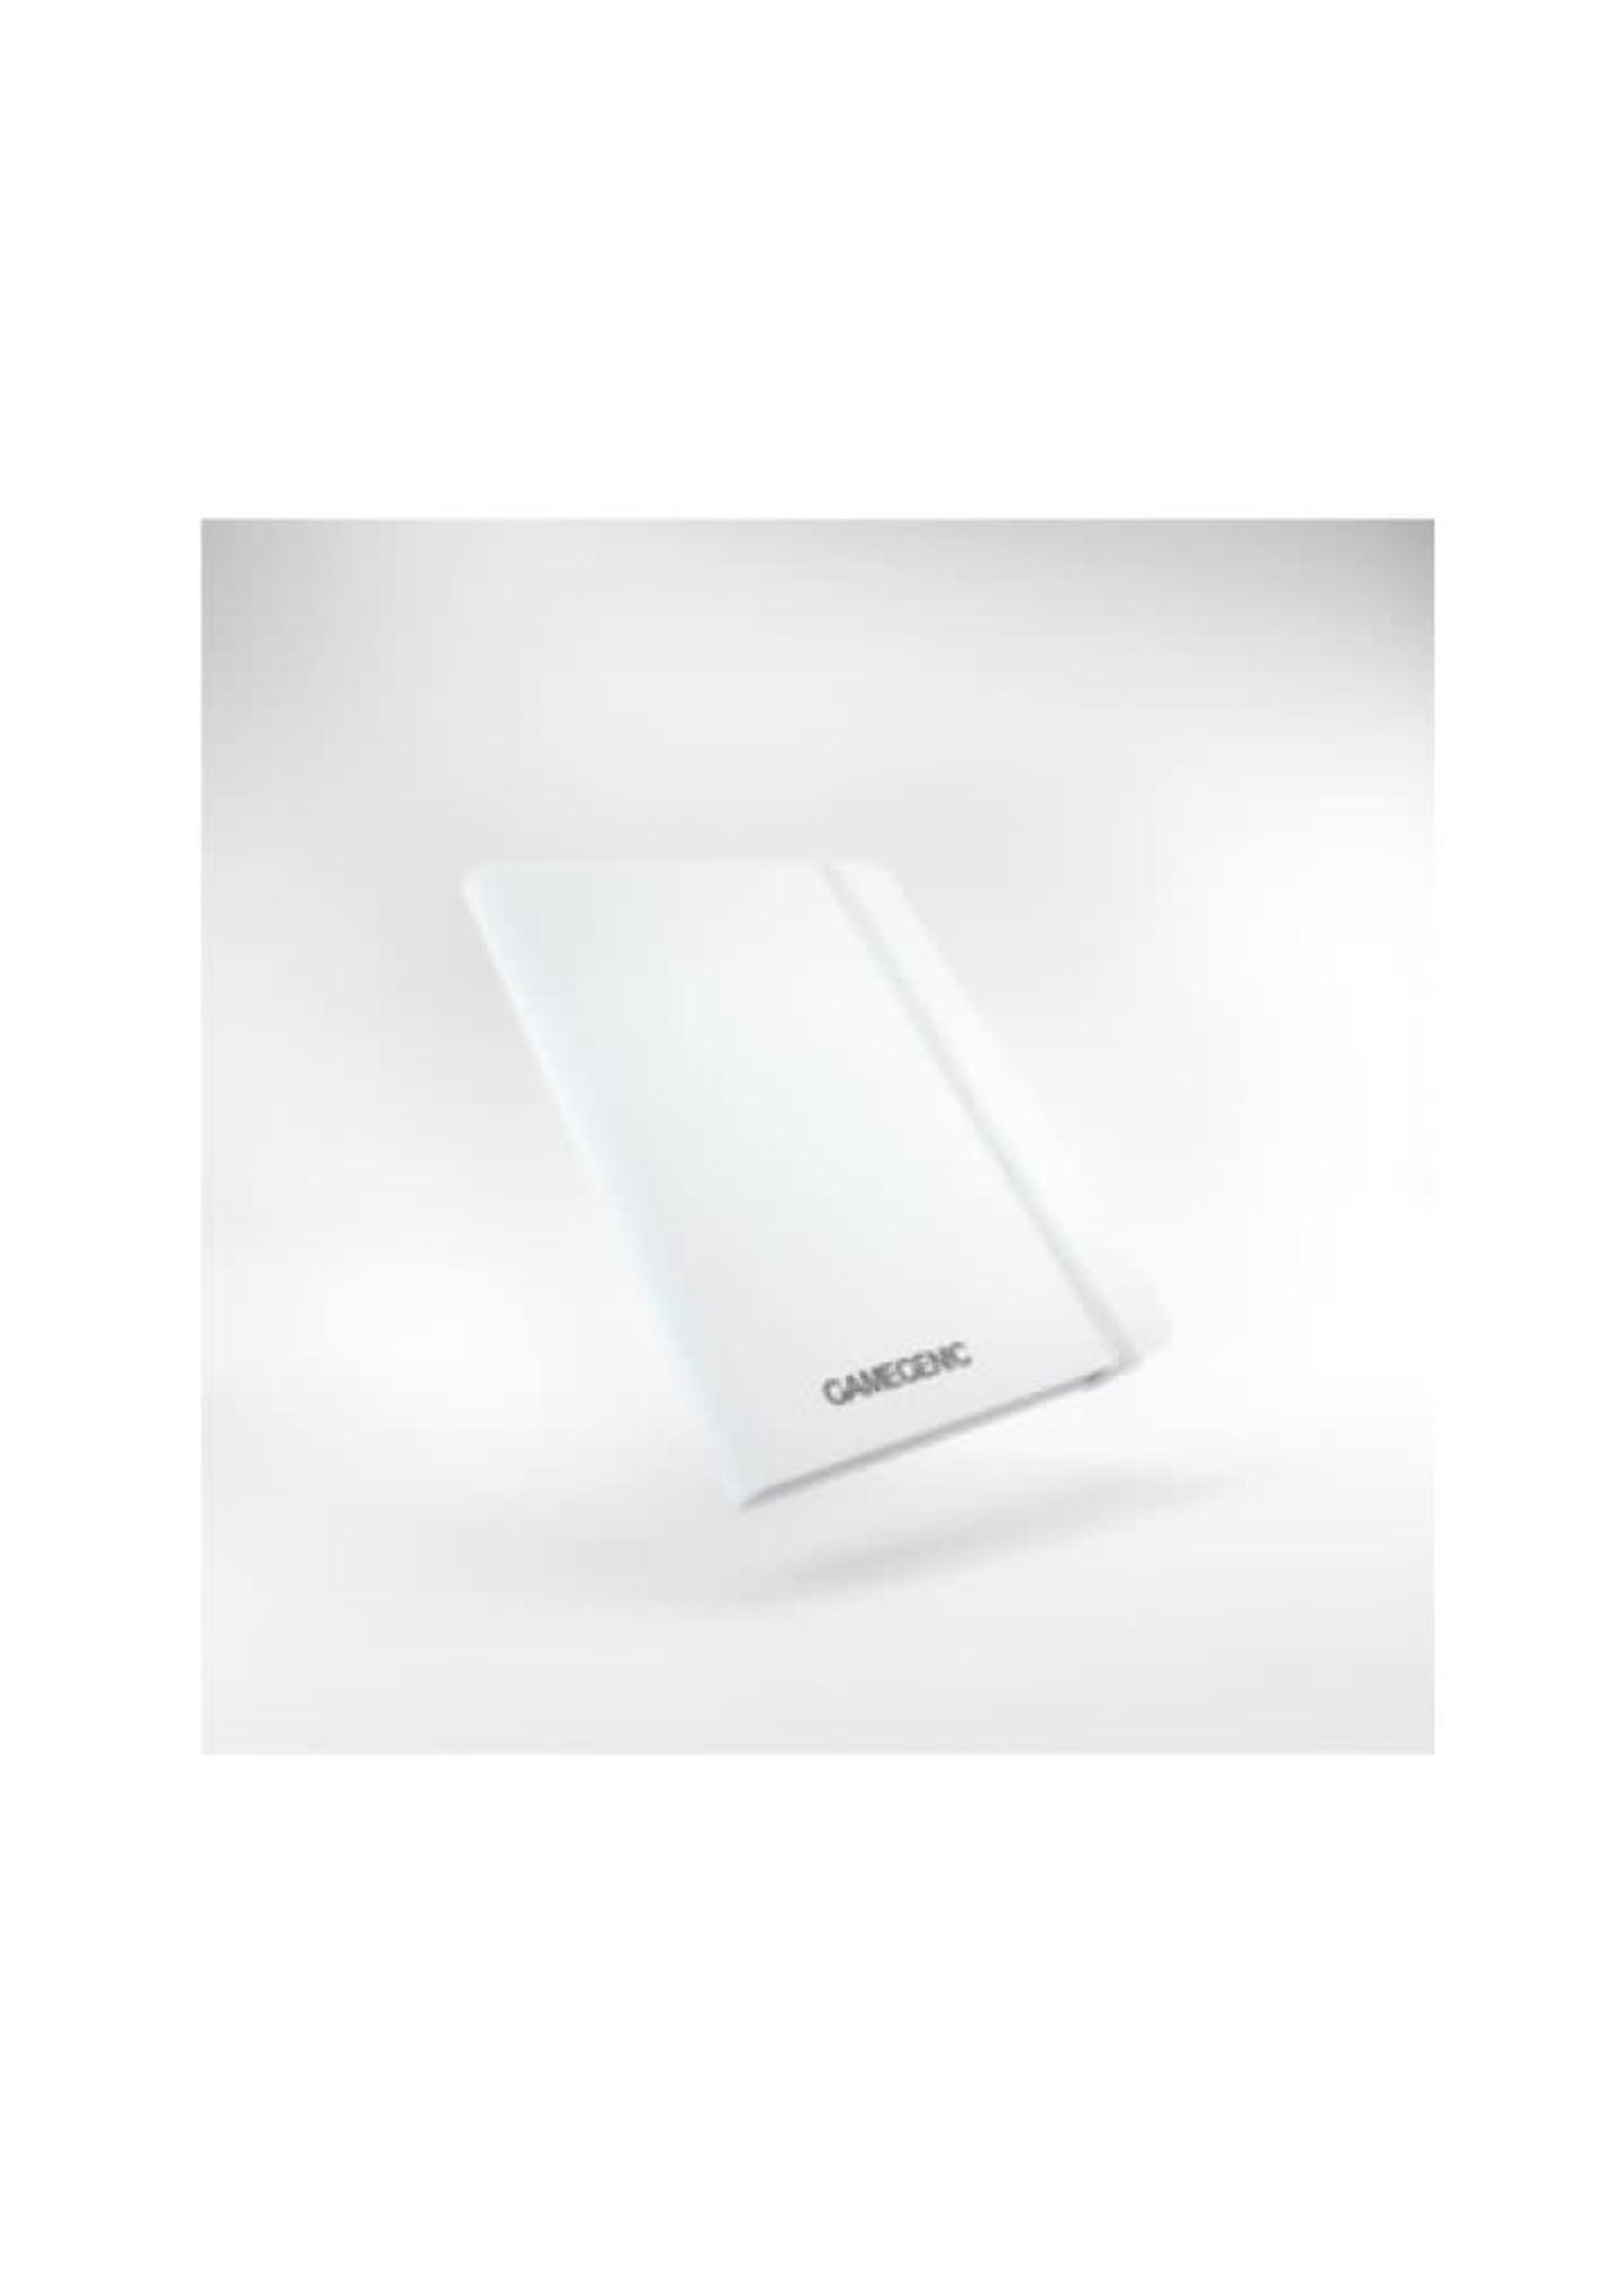 Gamegenic - Casual Album 18-Pocket White